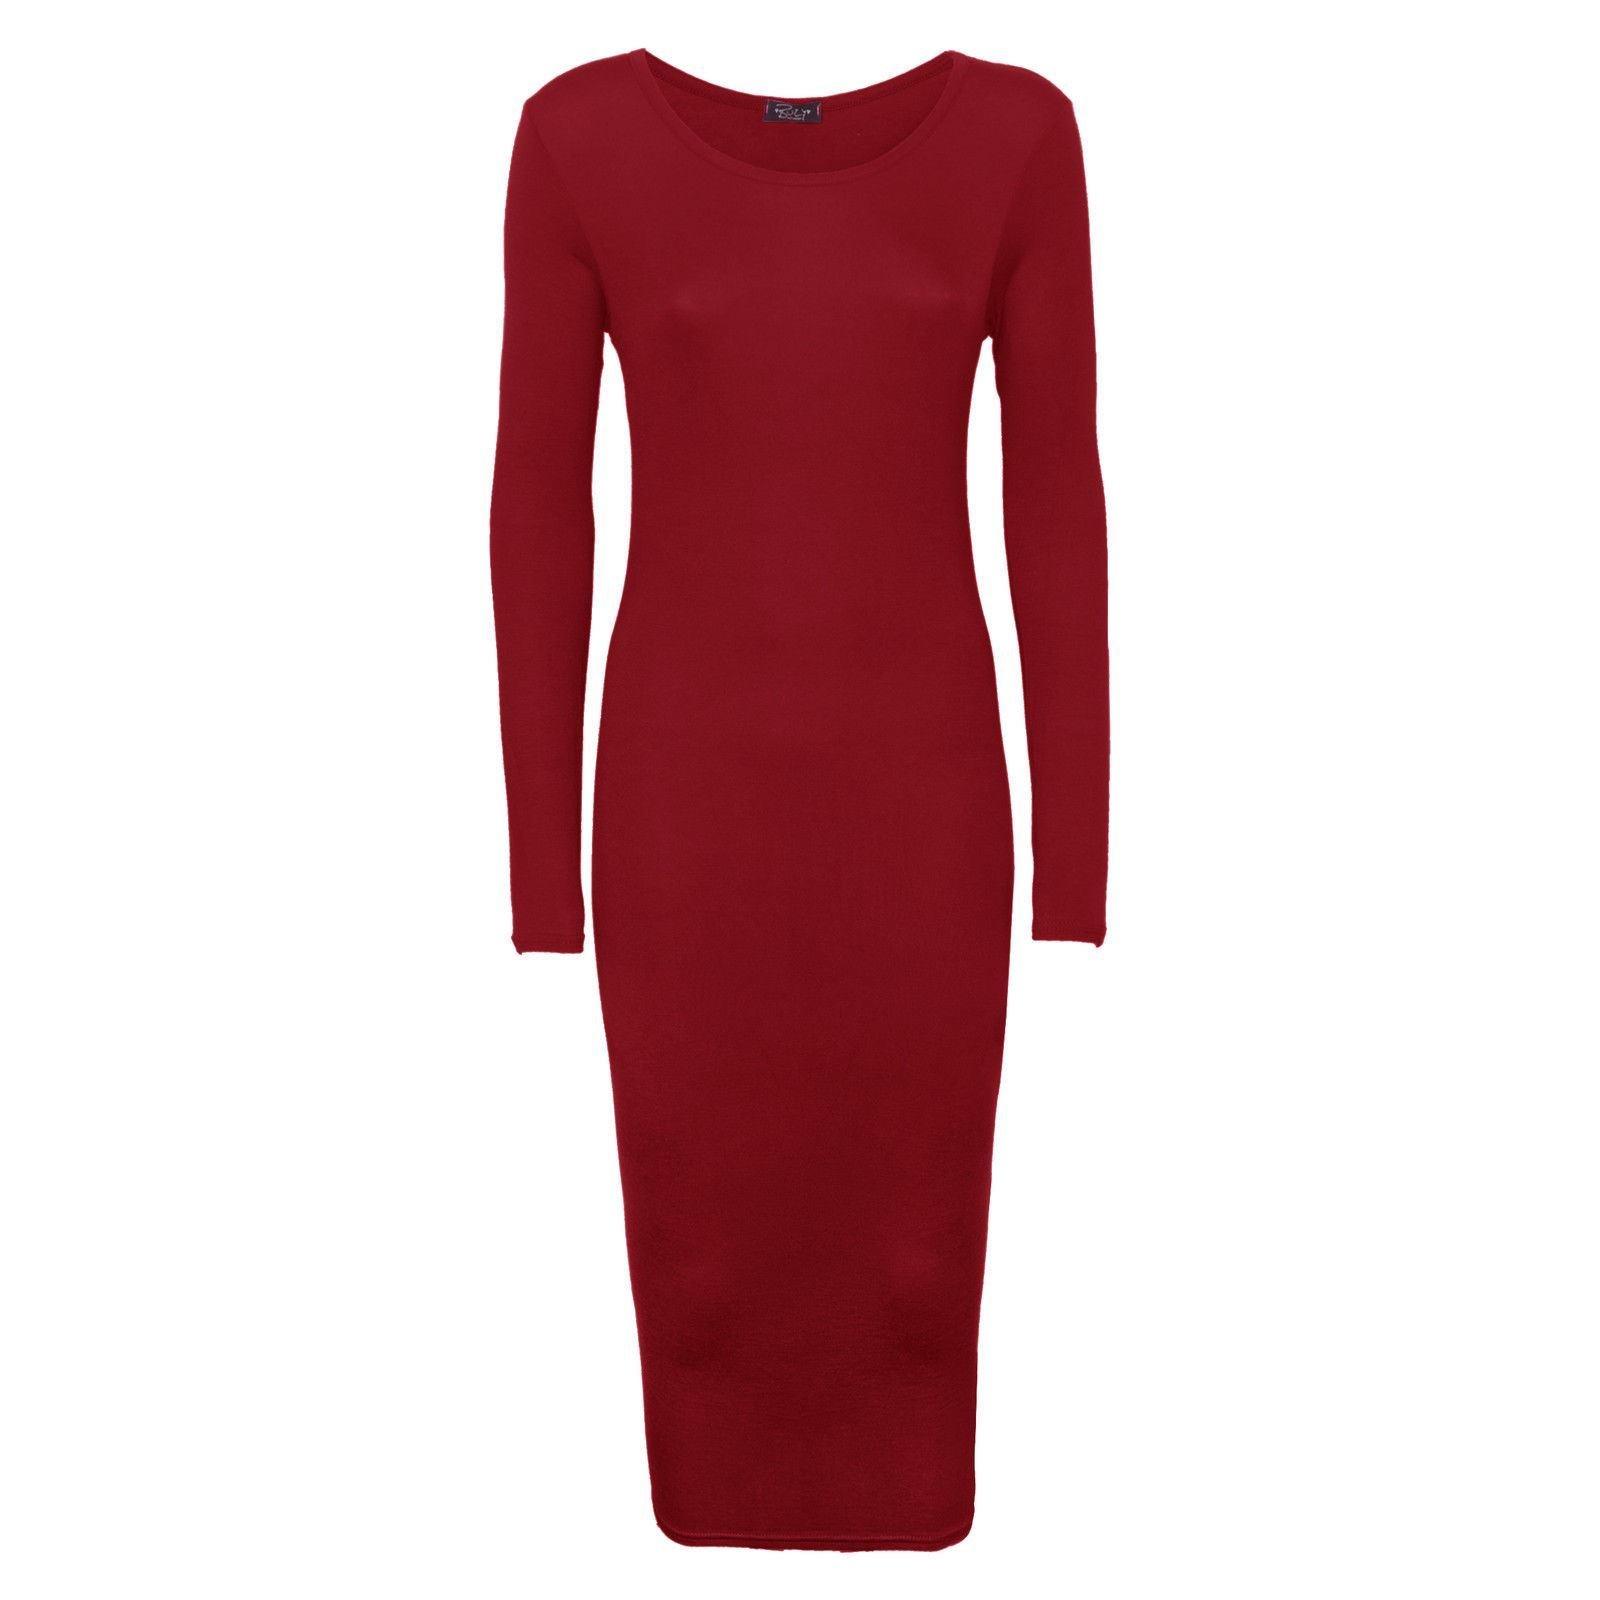 Available at Amazon: Crazy Girls Women's Ladies Long Sleeve Scoop Neck Midi Dress